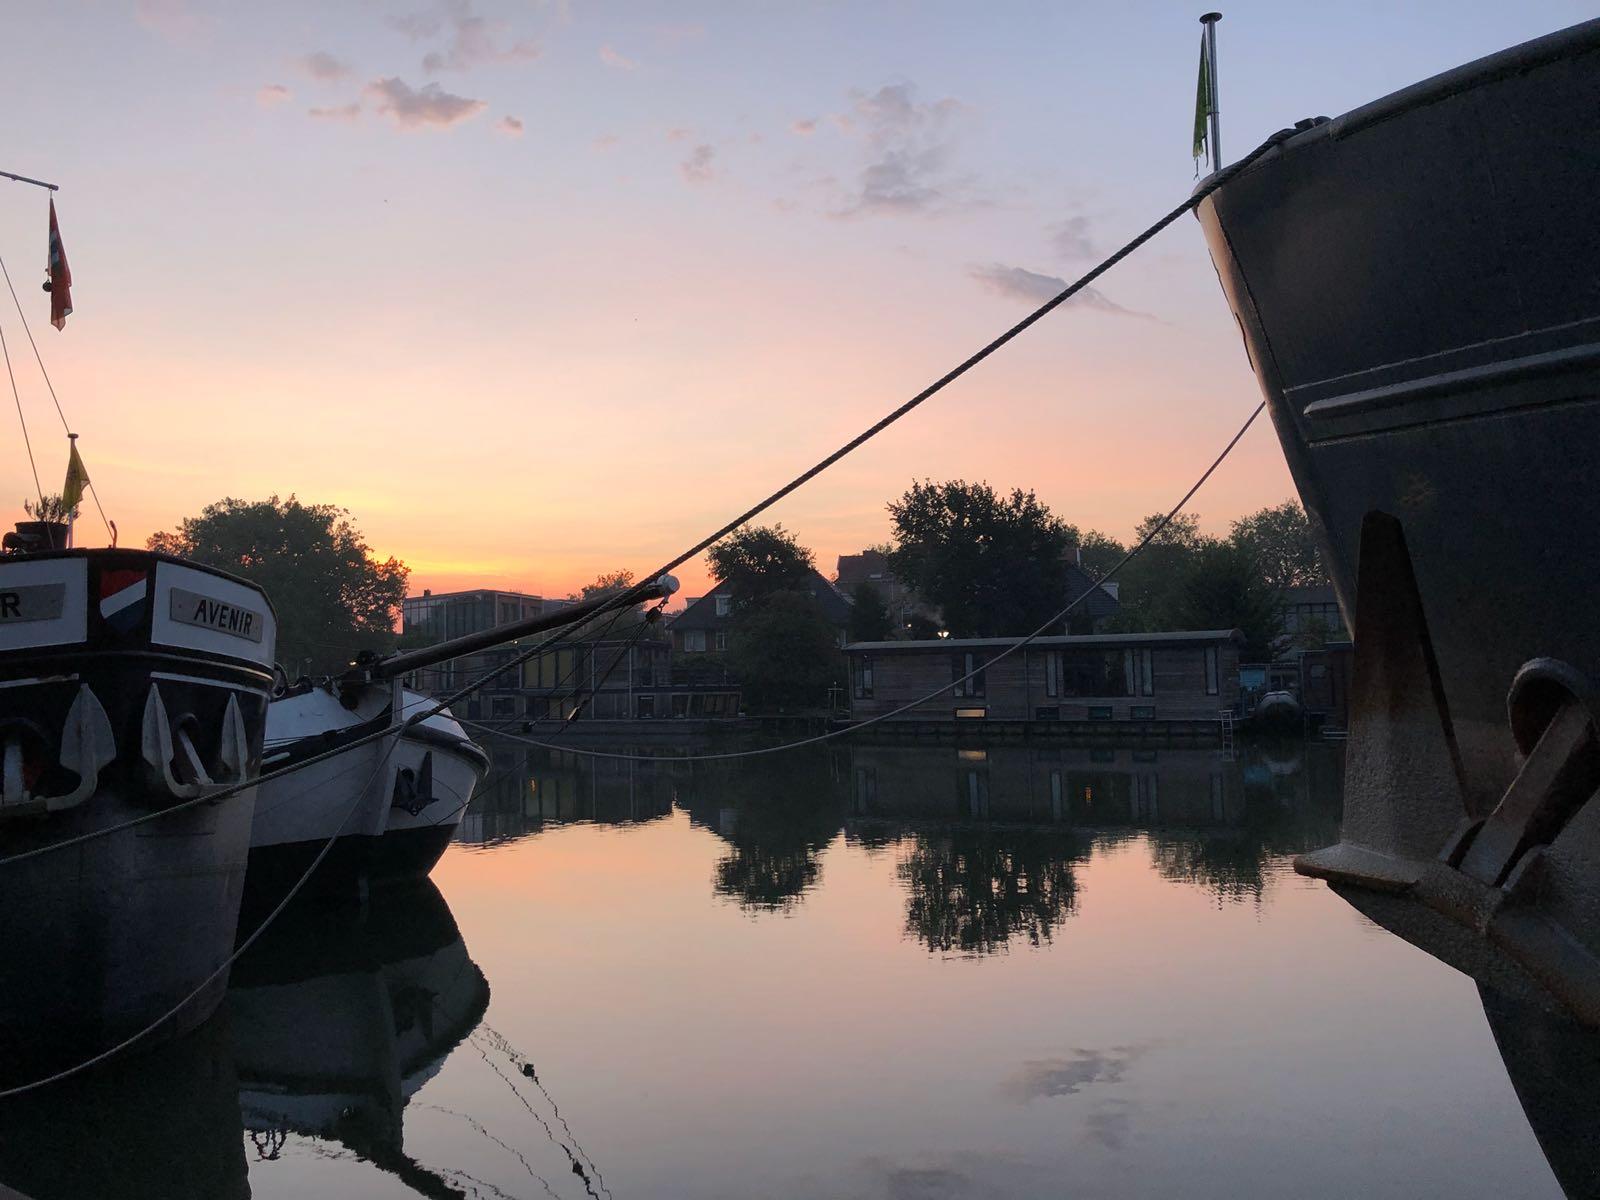 Vreeswijk zonsopgang